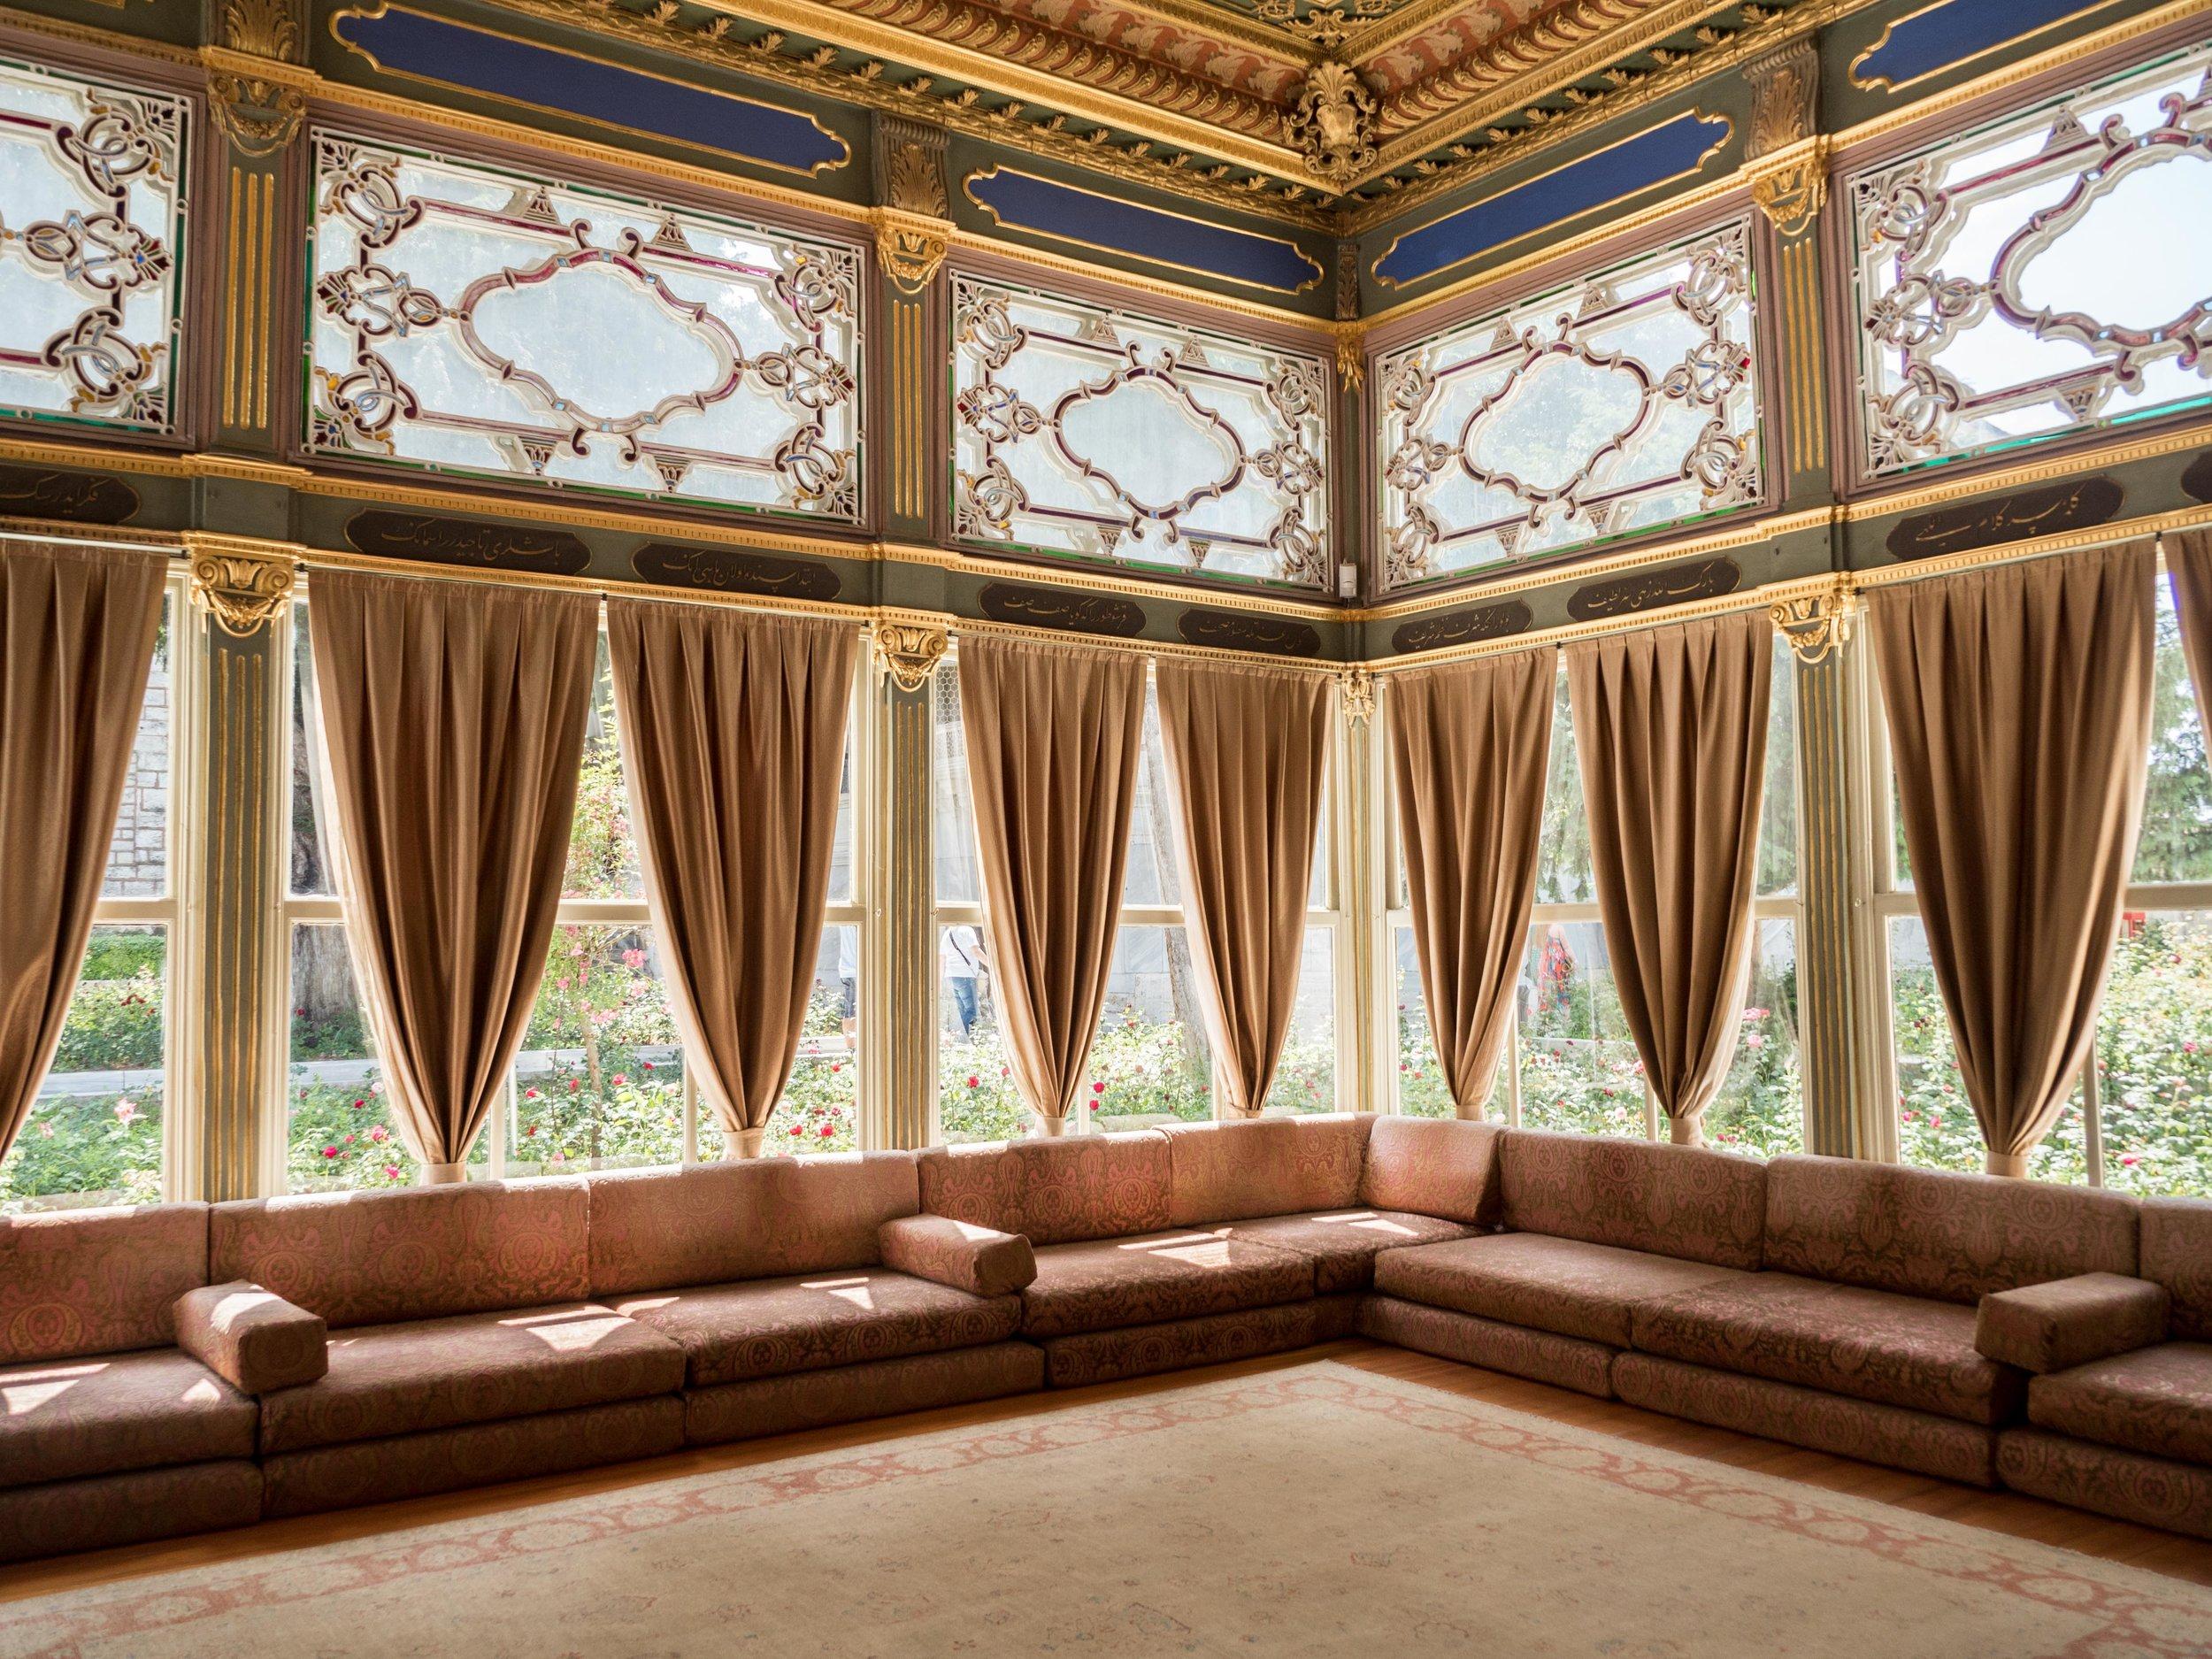 Mustafa Pasha's Kiosk Interior